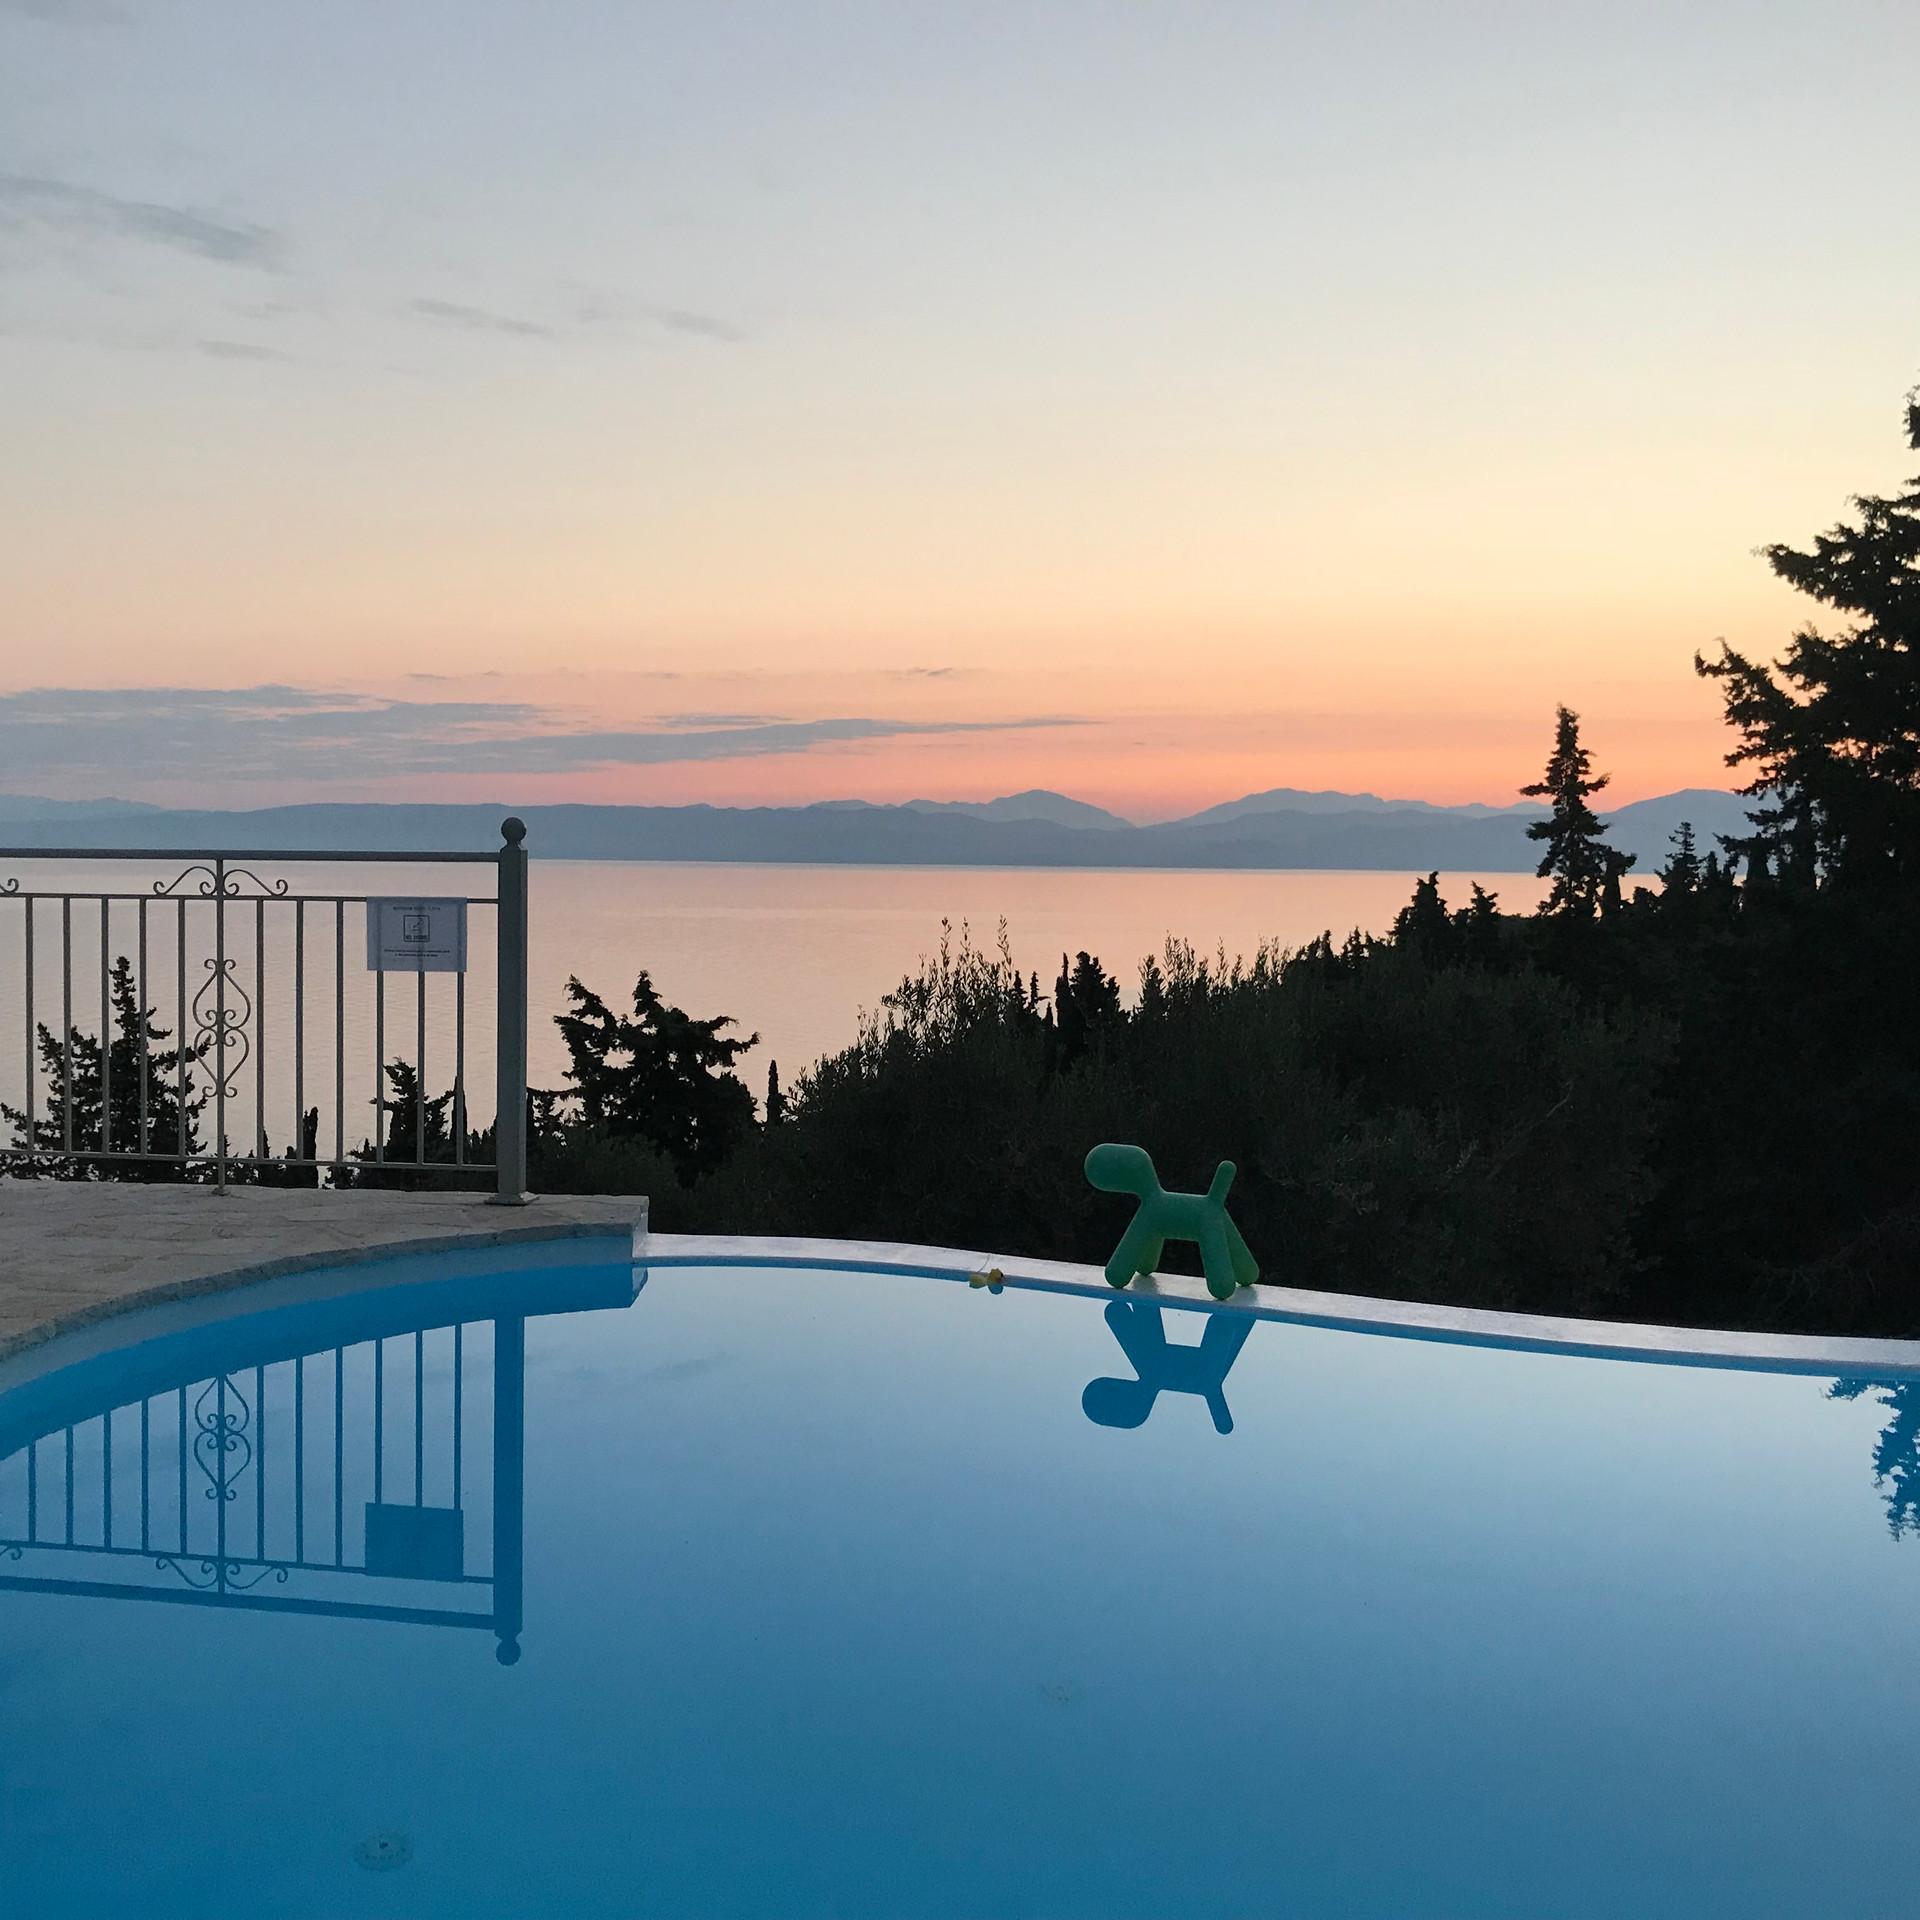 Sunrise at the villa